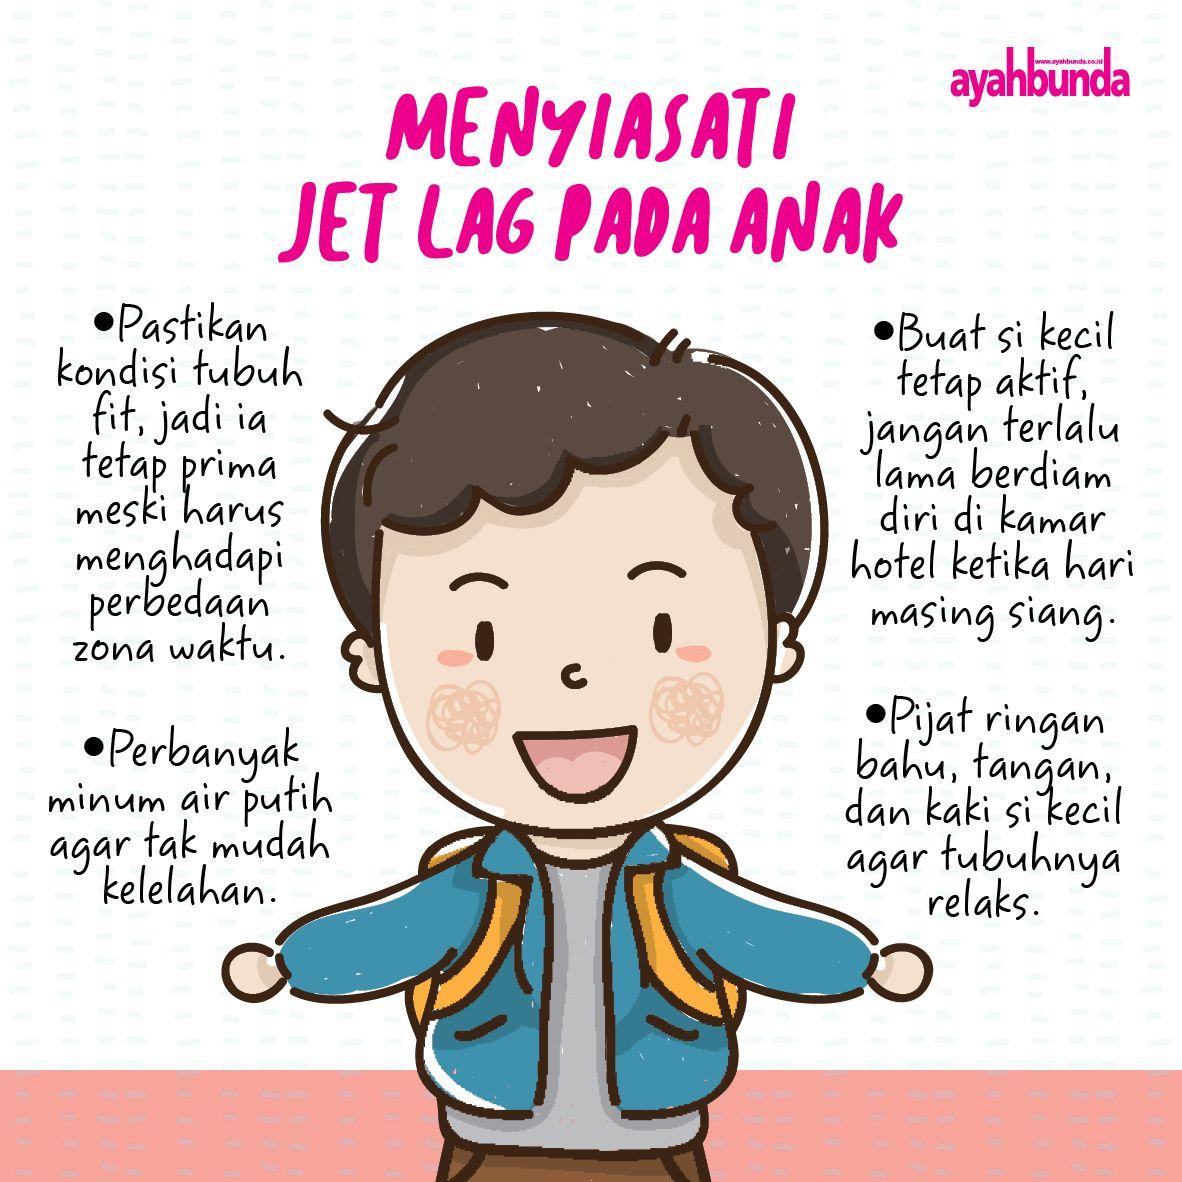 Instagram 2019 Ayahbunda Di 2020 Anak Jet Lag